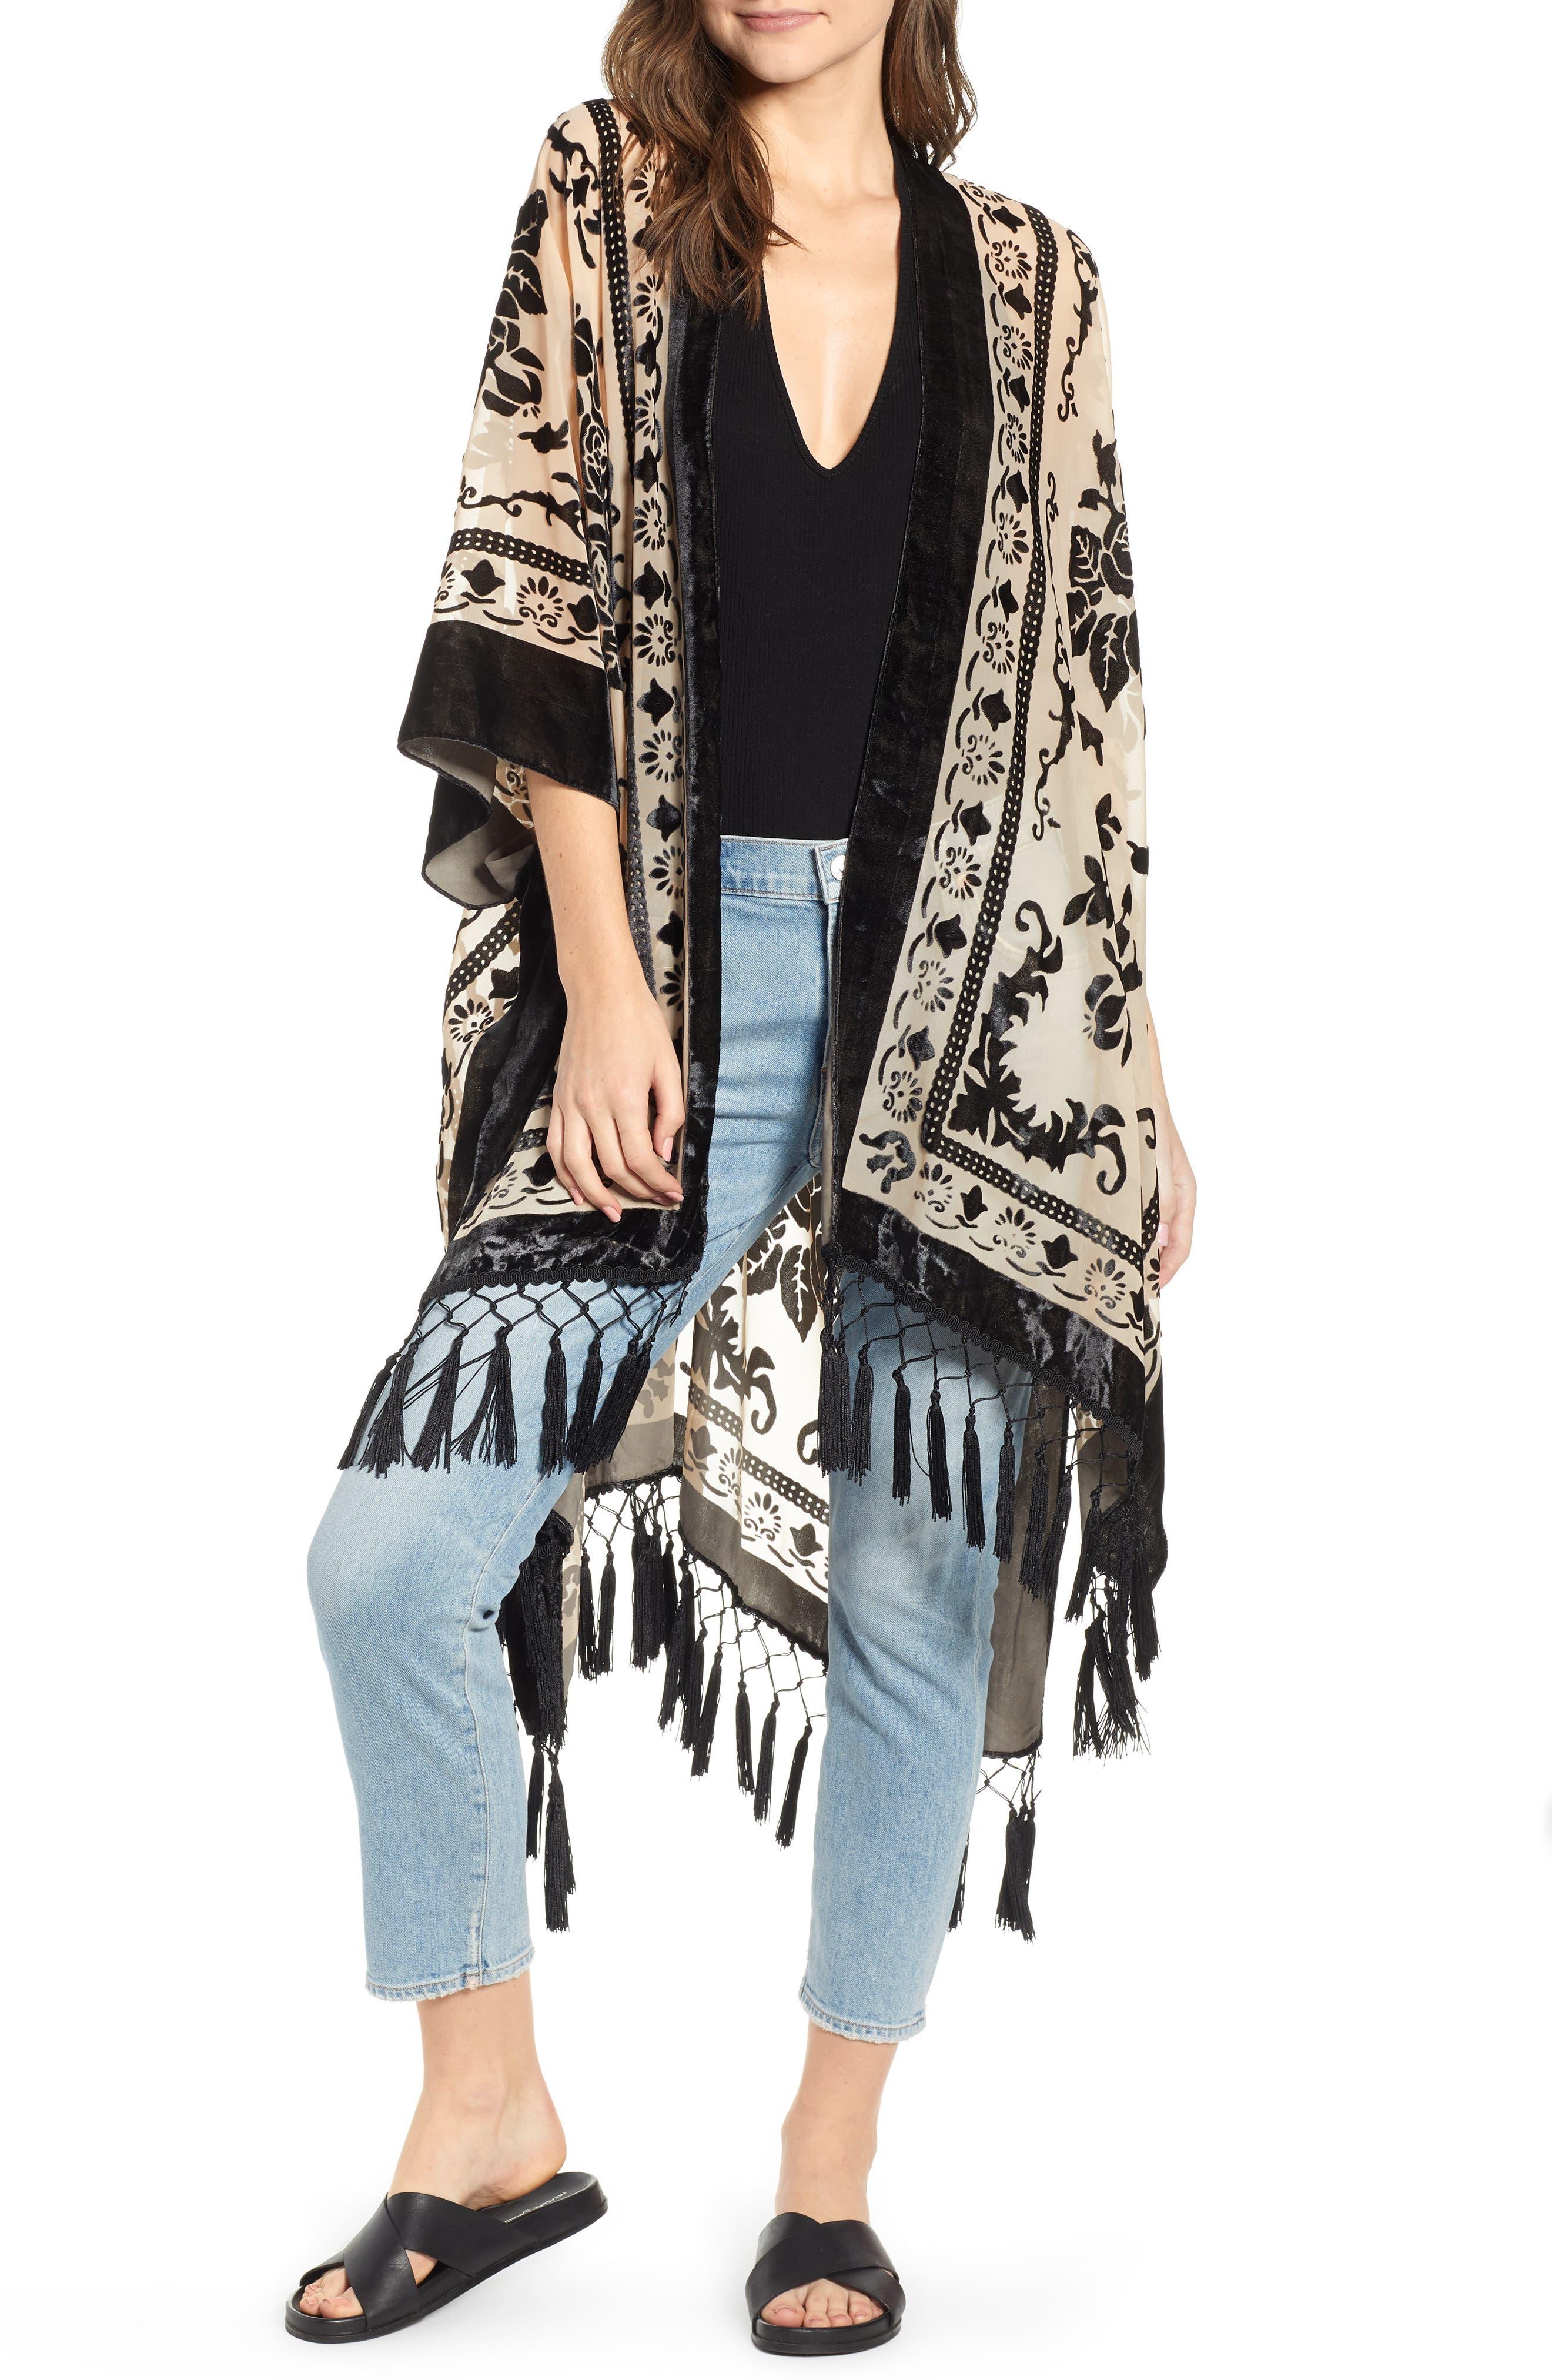 Shawls & Wraps | Vintage Lace & Fur Evening Scarves Womens Free People Nightbird Velvet Duster Size One Size - Black $88.00 AT vintagedancer.com